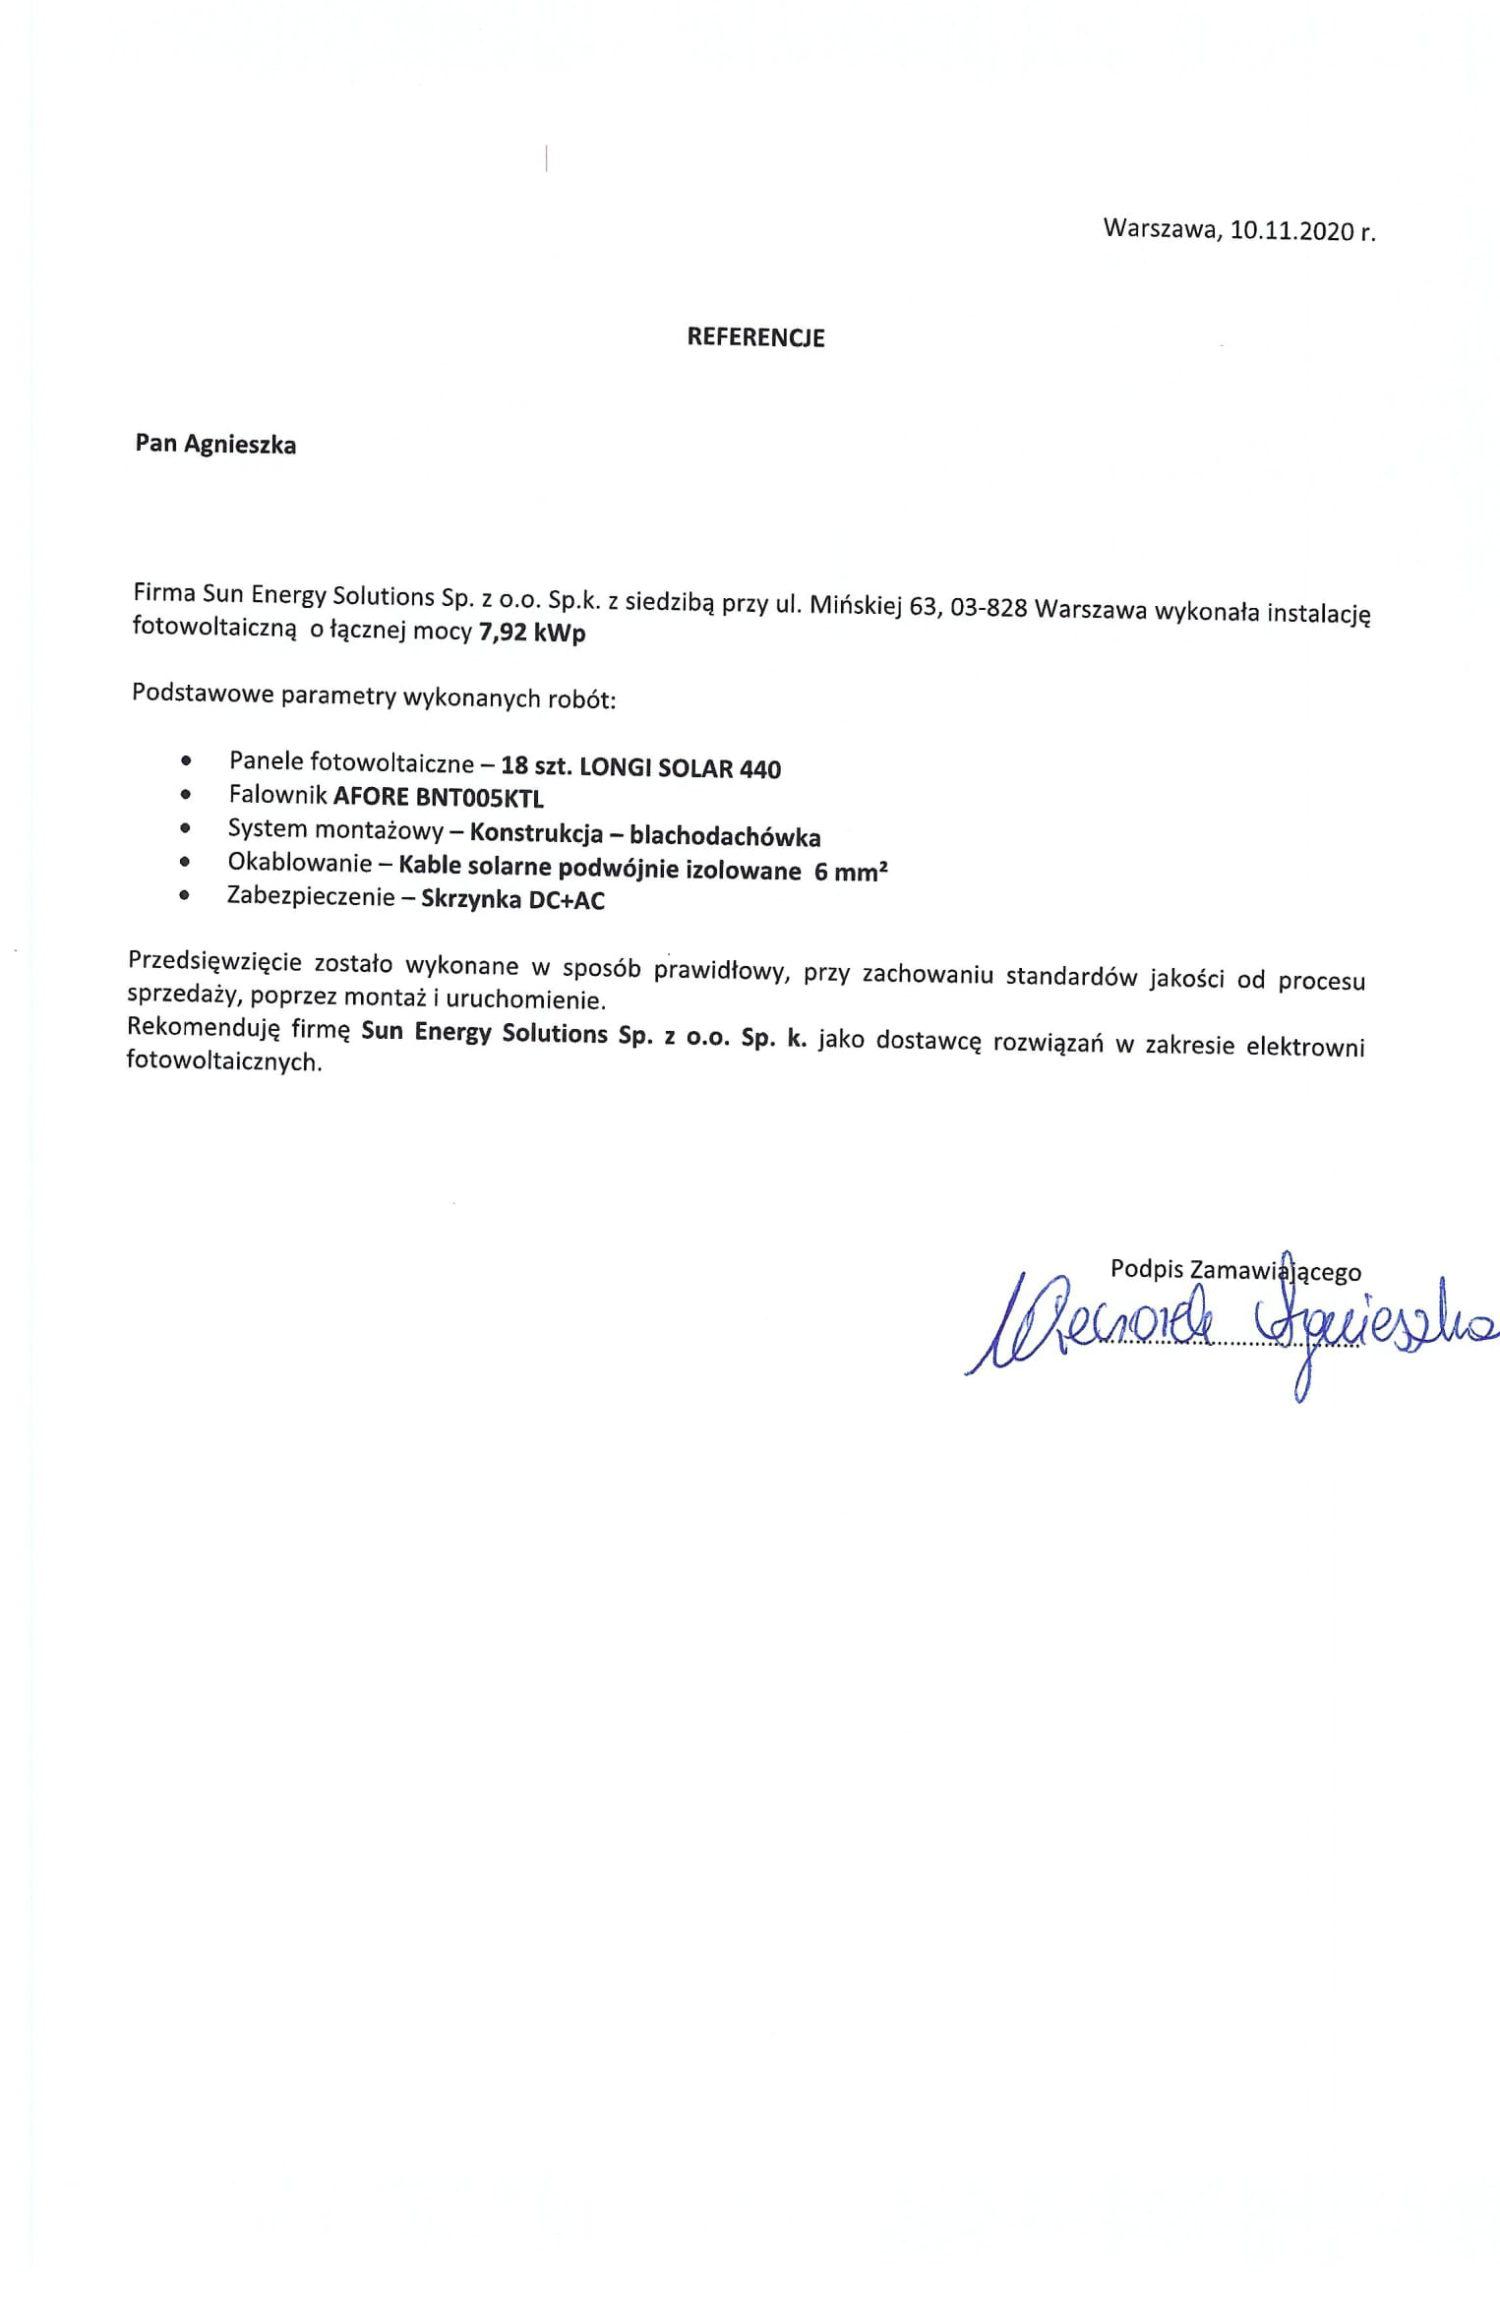 Referencja - Listopad 2020-1